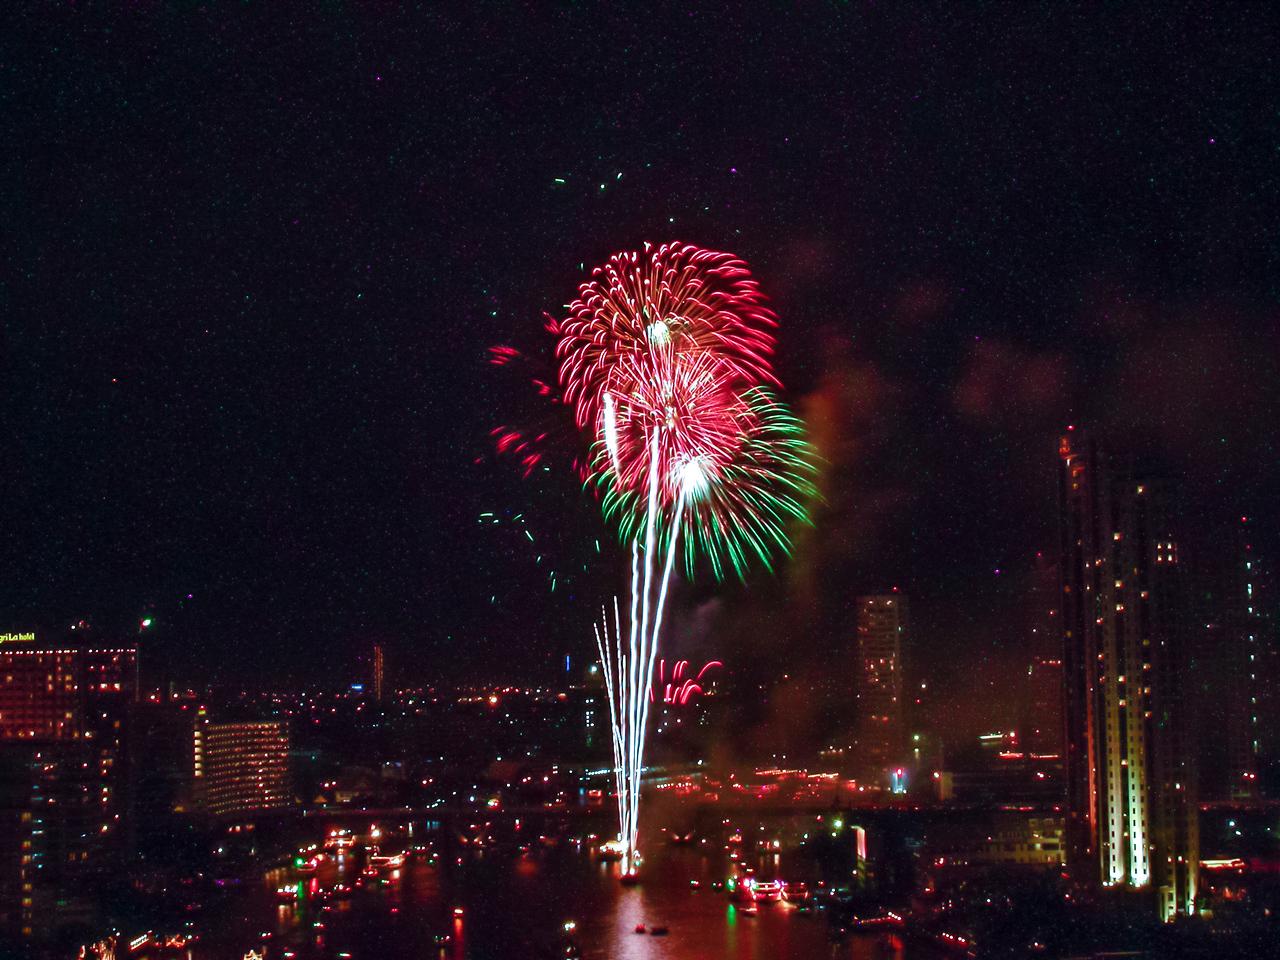 Loy Krathong fireworks over Chao Phraya River, Bangkok 2005